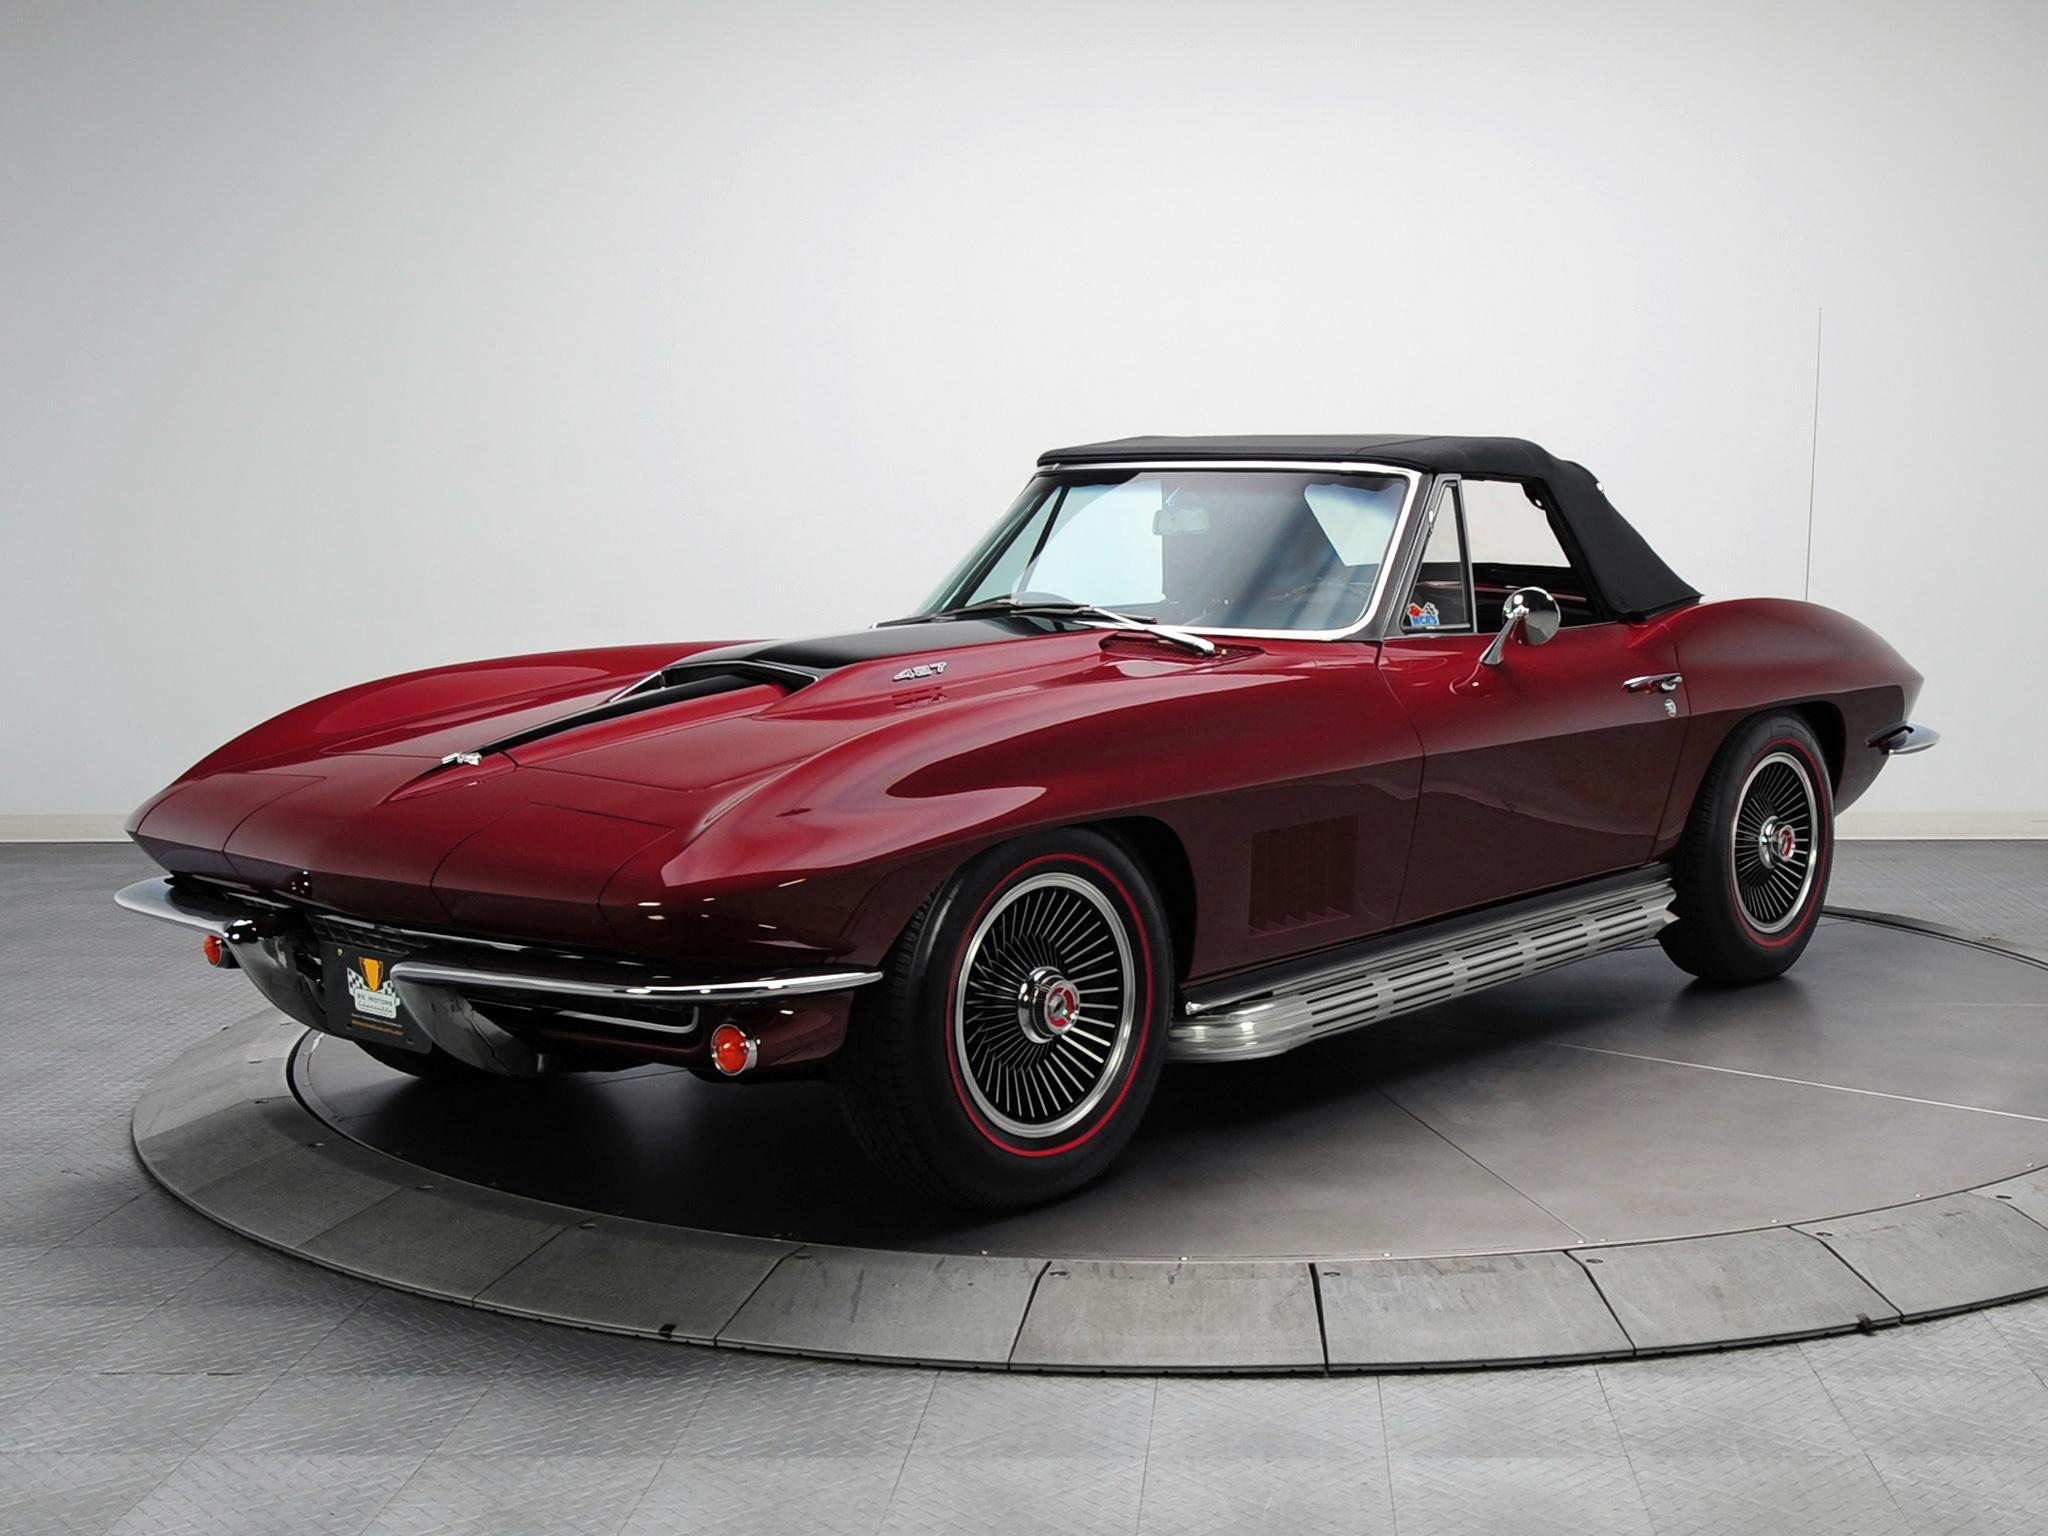 1967 chevrolet corvette sting ray l88 427 convertible c 2 supercar muscle classic v wallpaper. Black Bedroom Furniture Sets. Home Design Ideas